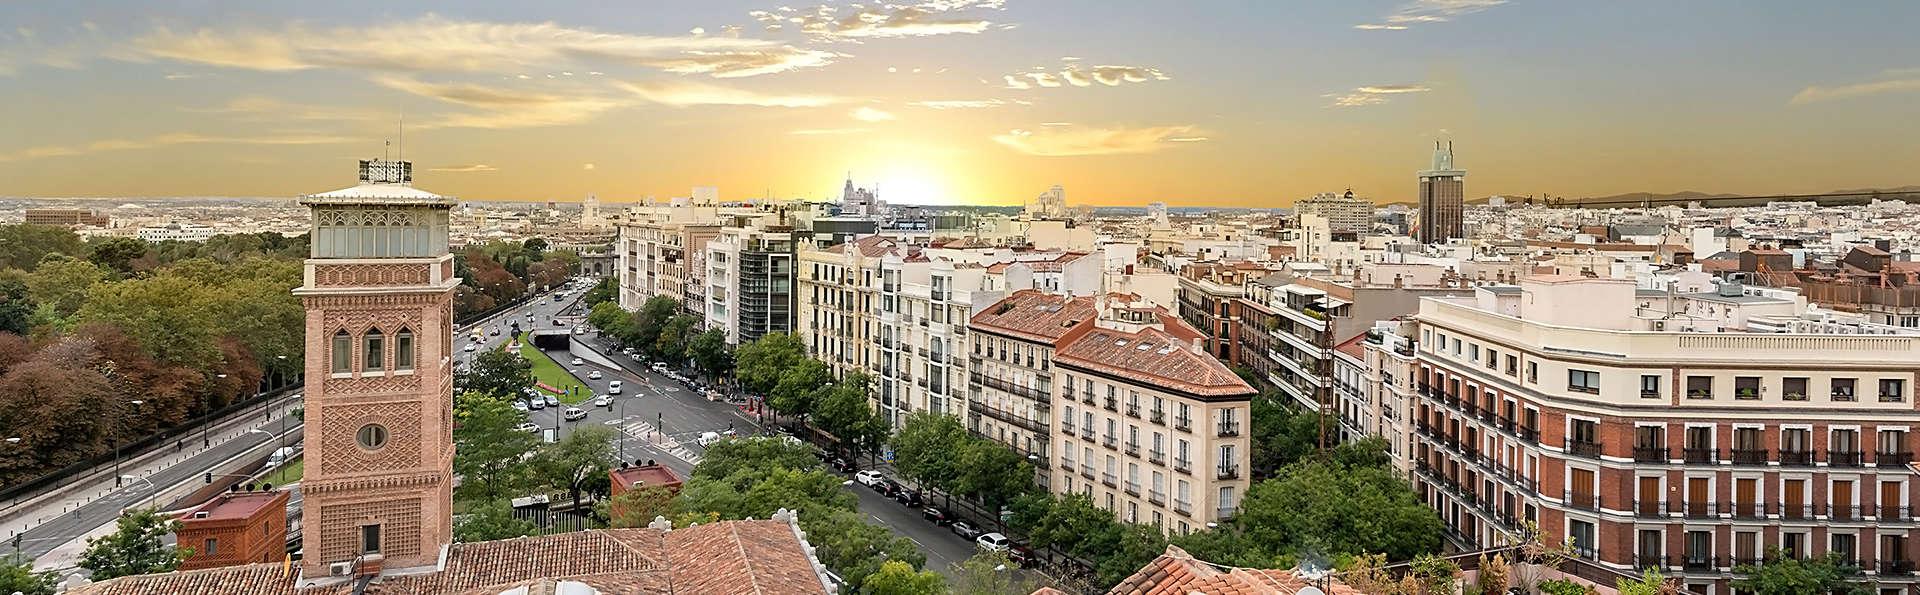 H10 Puerta de Alcalá - EDIT_view5.jpg